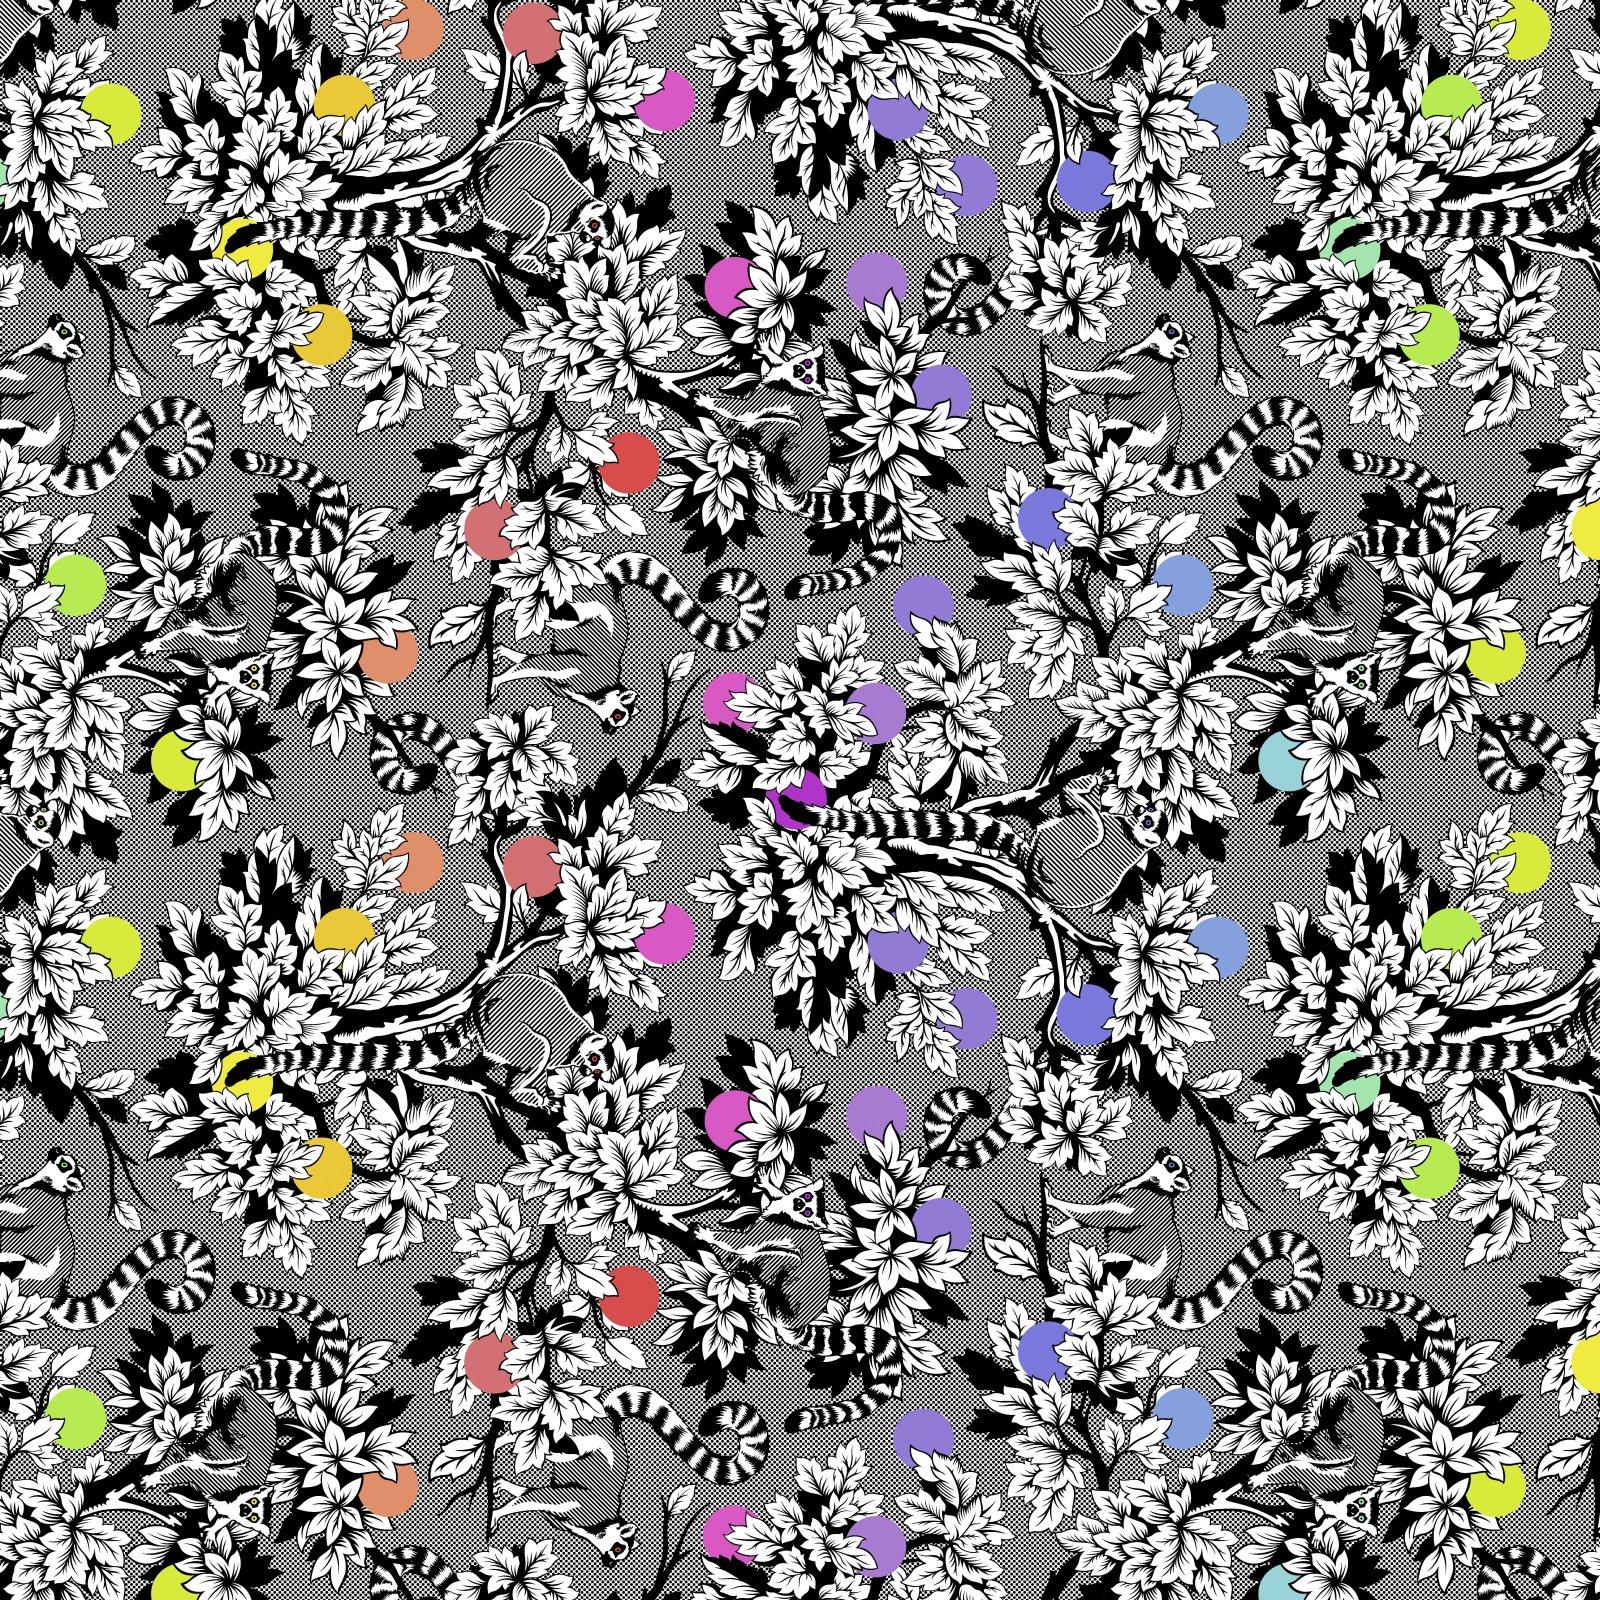 Free Spirit - Tula Pink - Linework - Lemur Me Alone in Ink - *PRE-ORDER